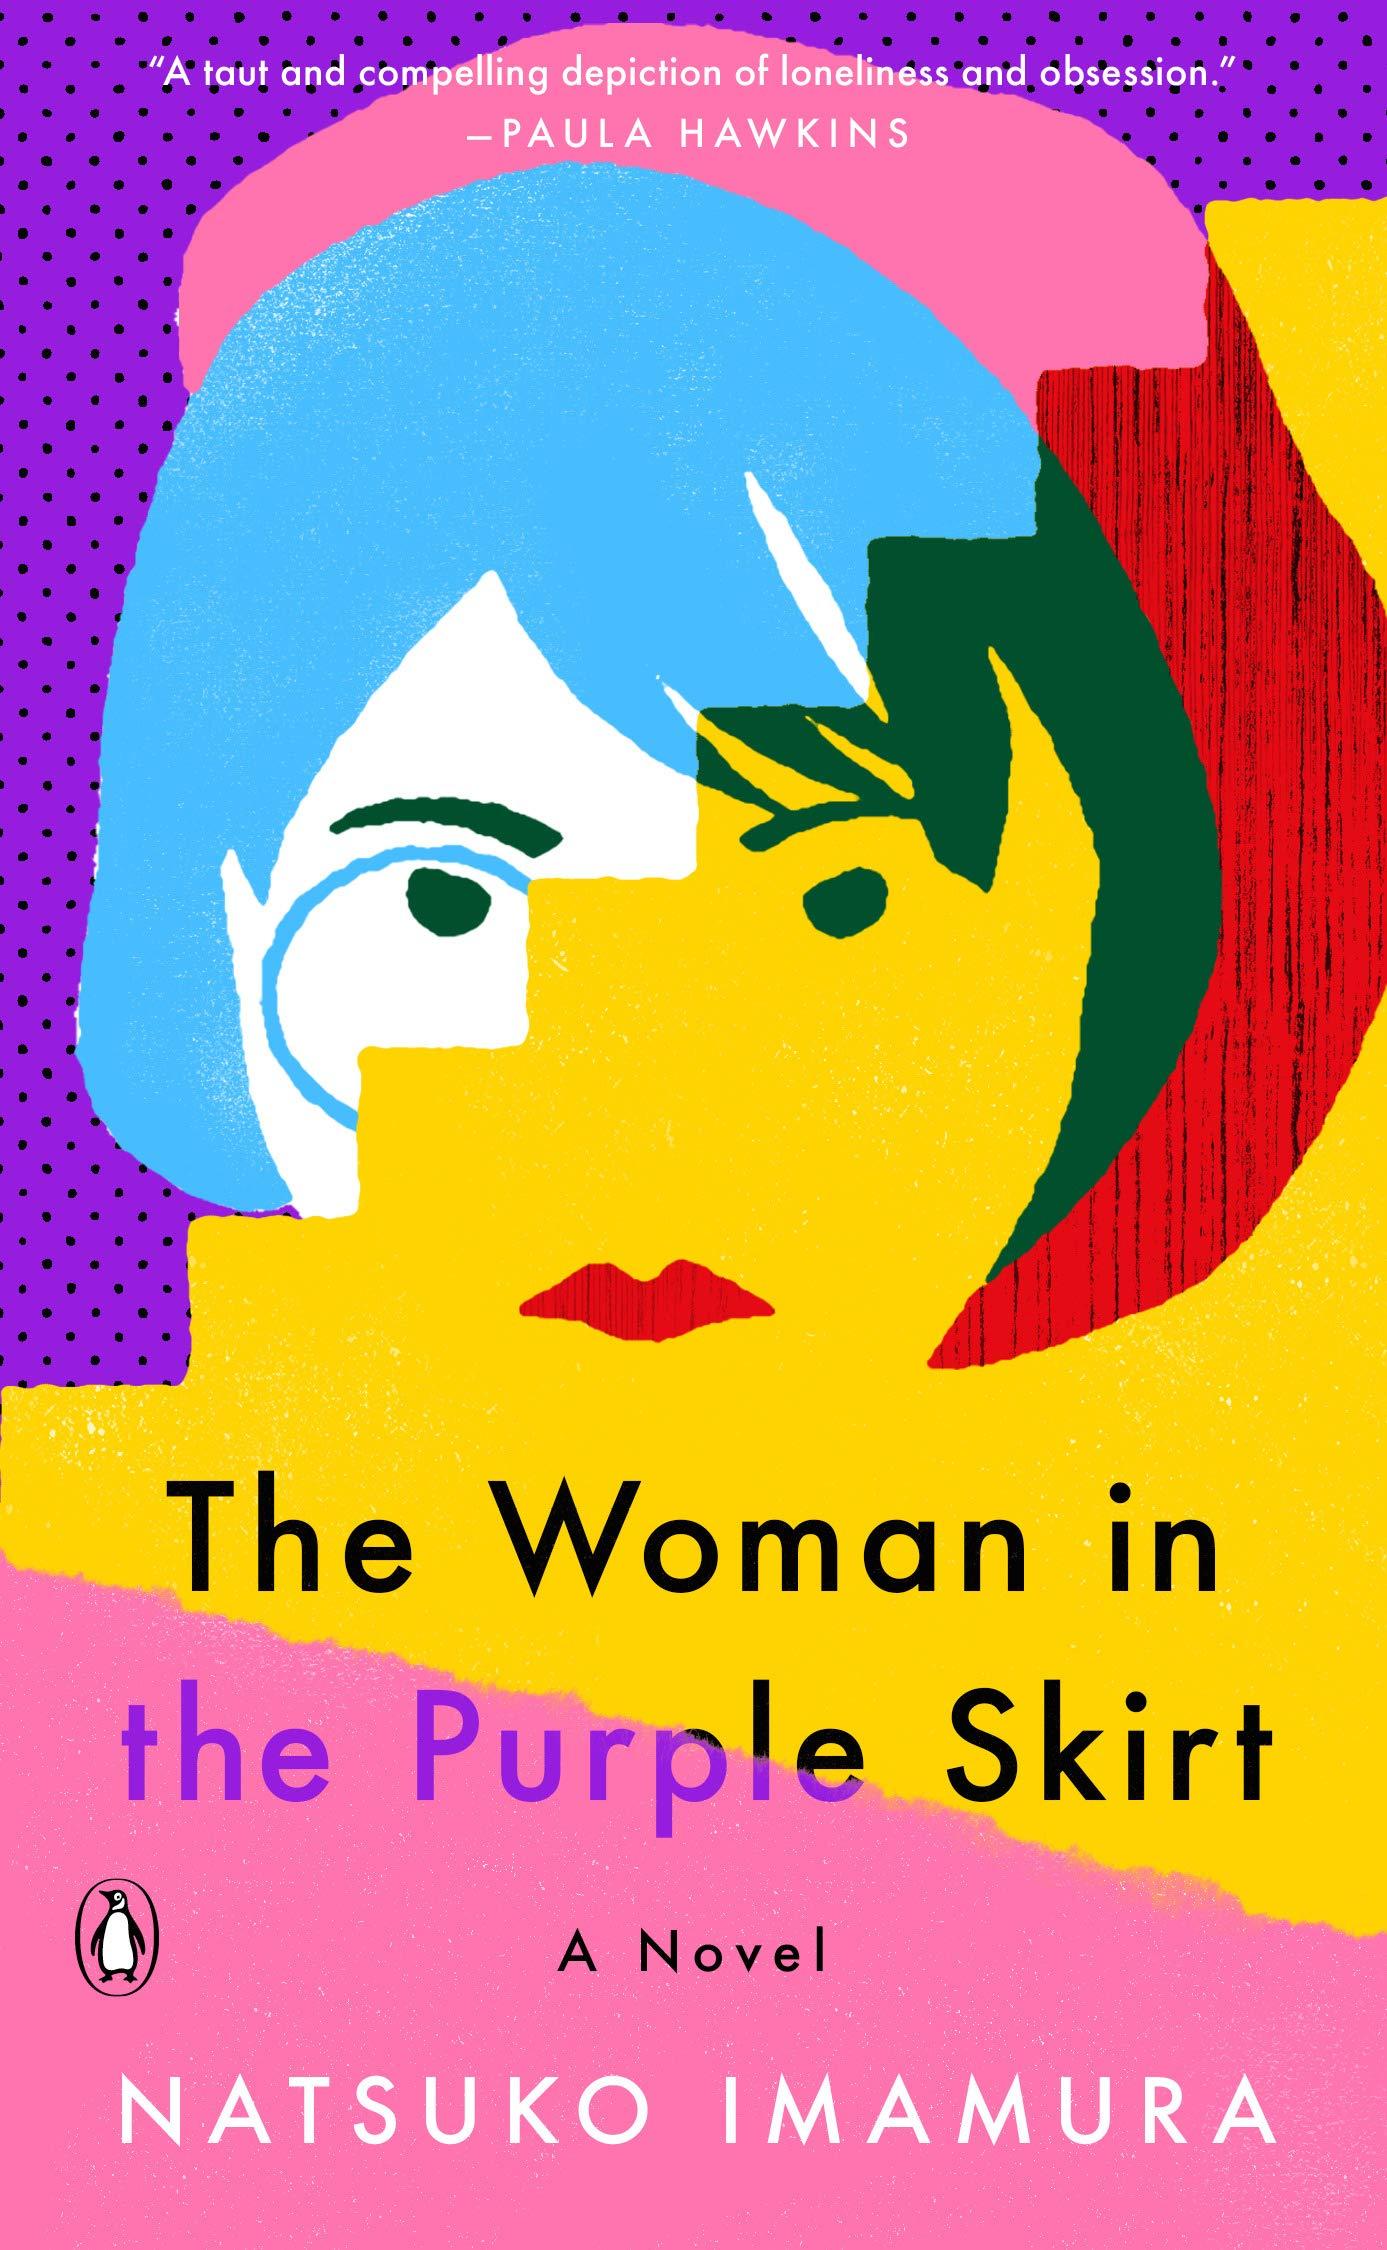 The Woman in the Purple Skirt: A Novel: Imamura, Natsuko, North, Lucy:  9780143136026: Amazon.com: Books